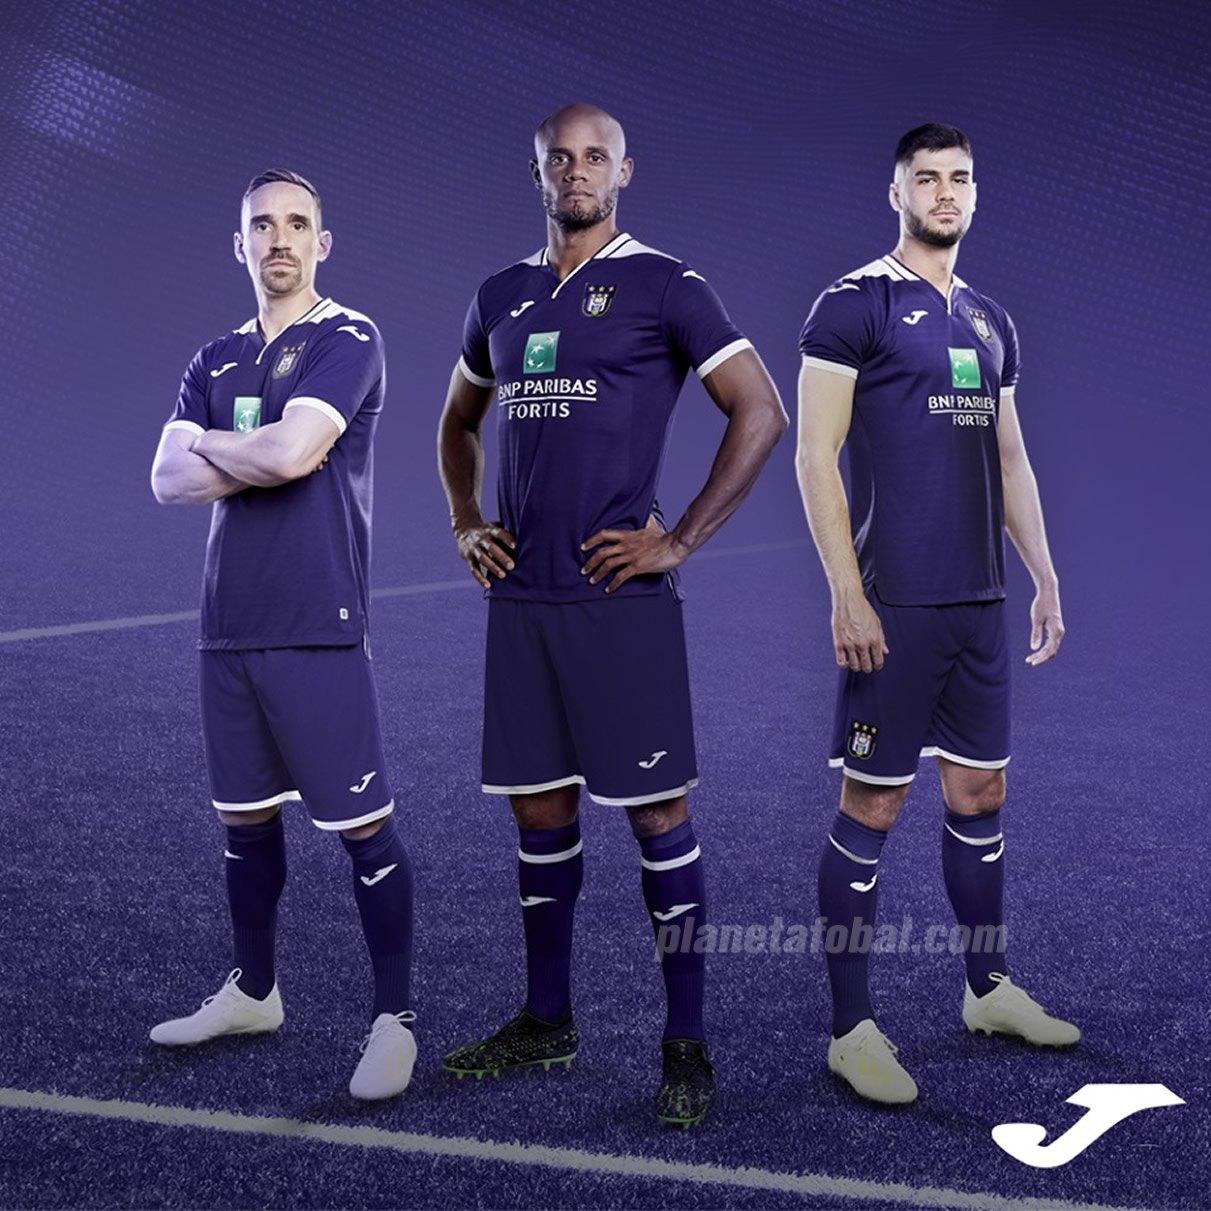 Camiseta titular Joma del Anderlecht 2019/20 | Imagen Web Oficial